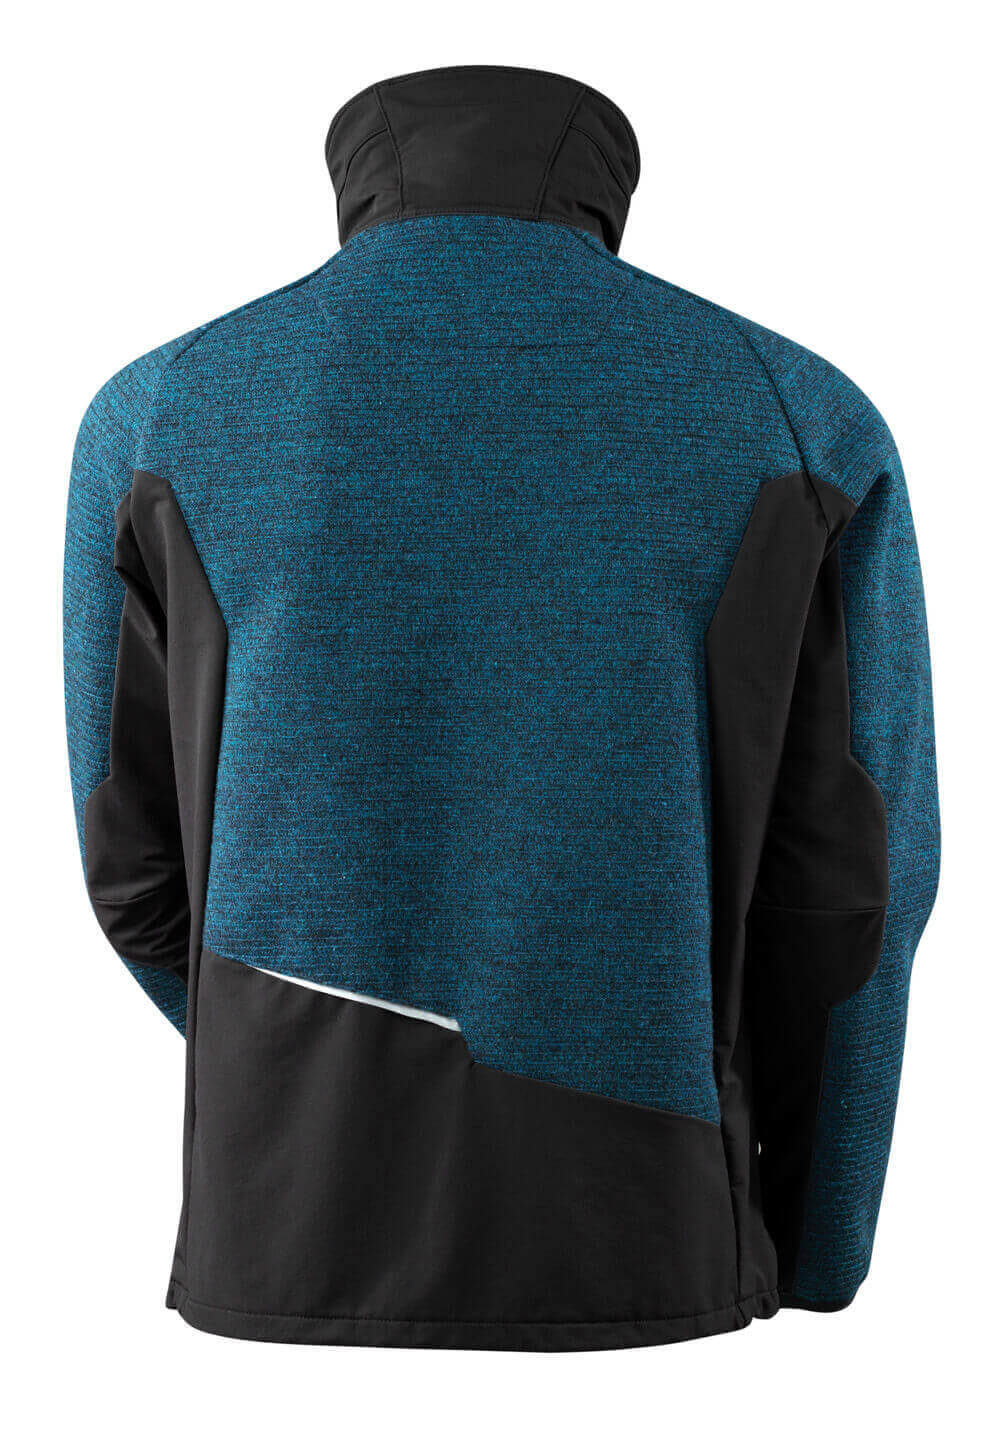 Knitted Jacket, half zip, membrane